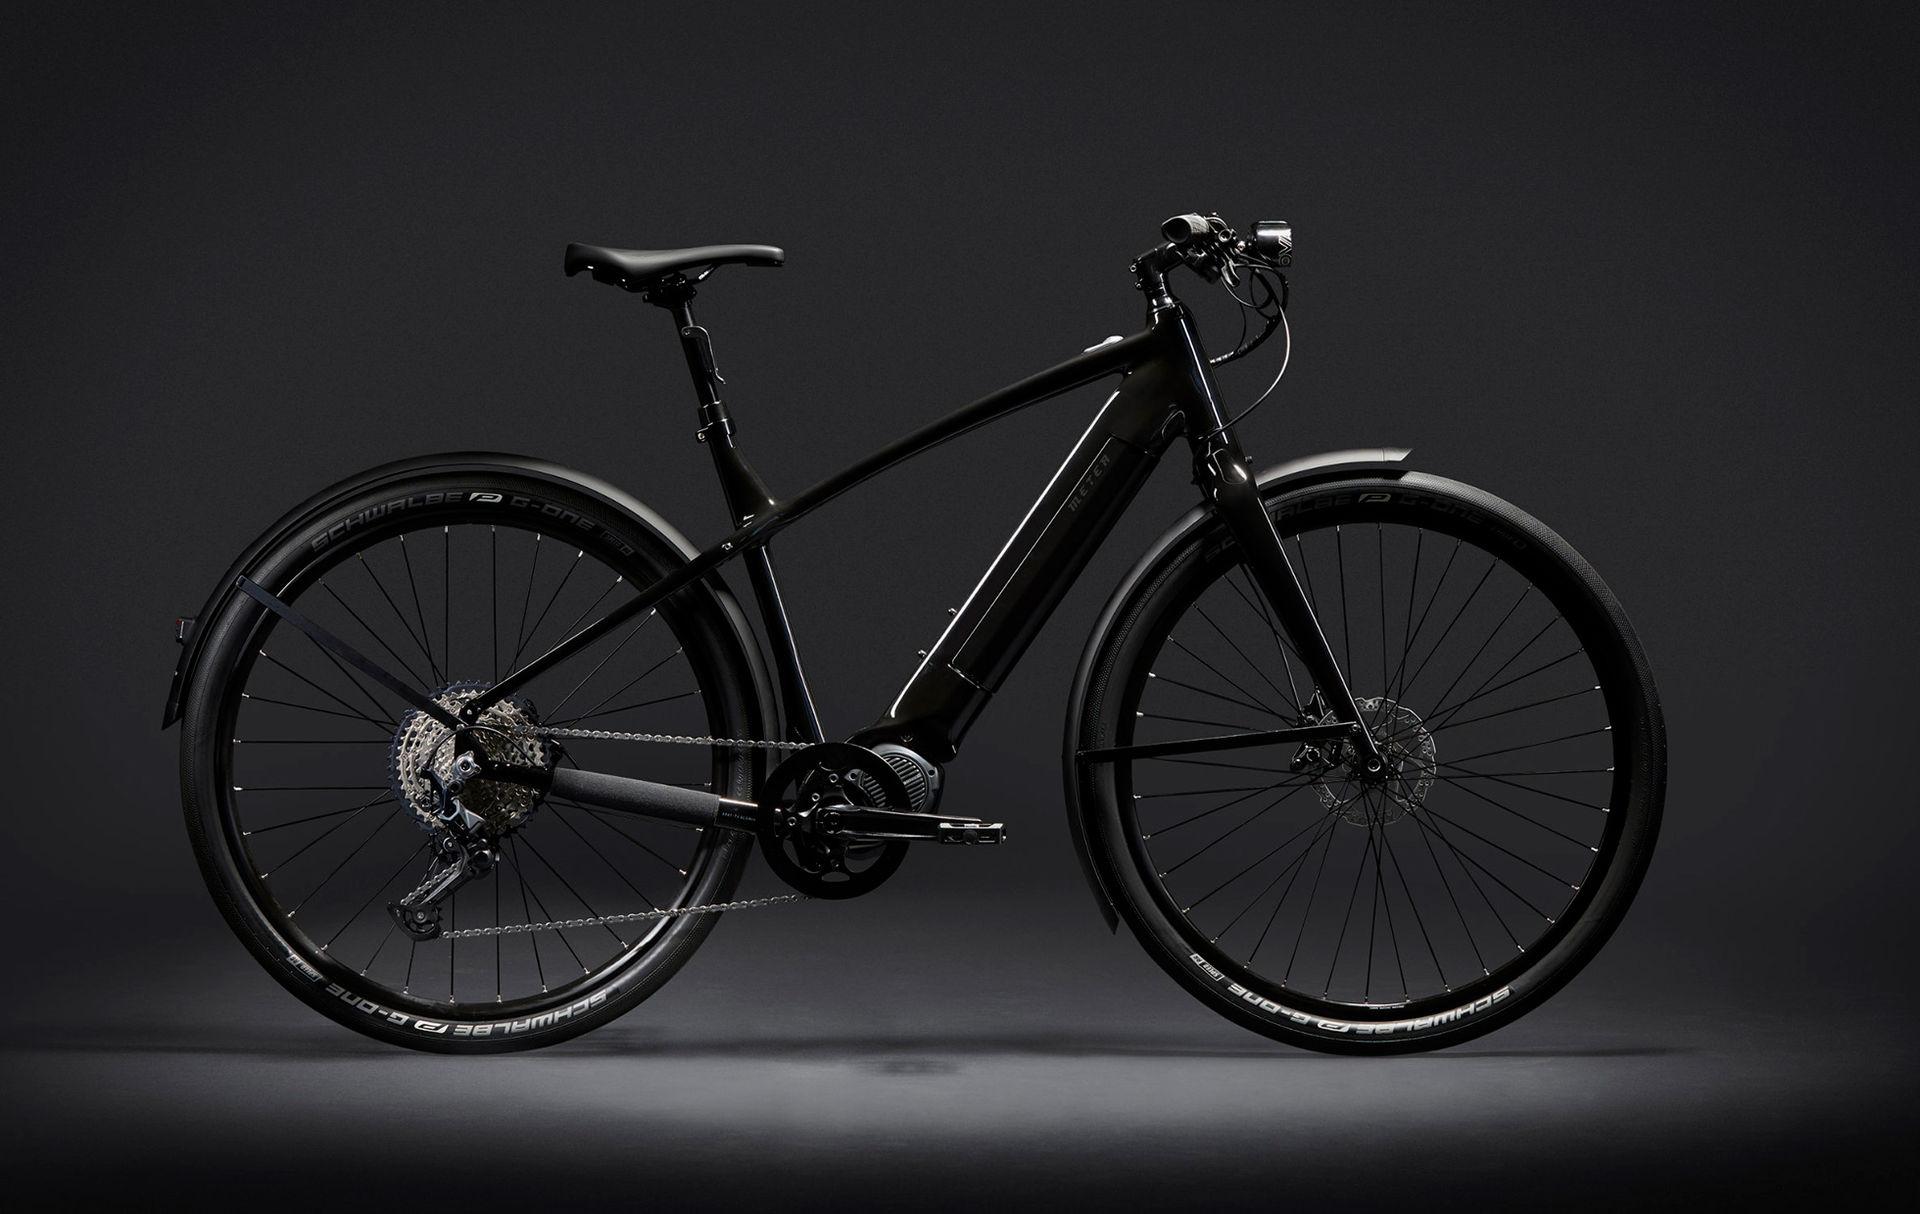 Meter Nite - ny svensk elcykel